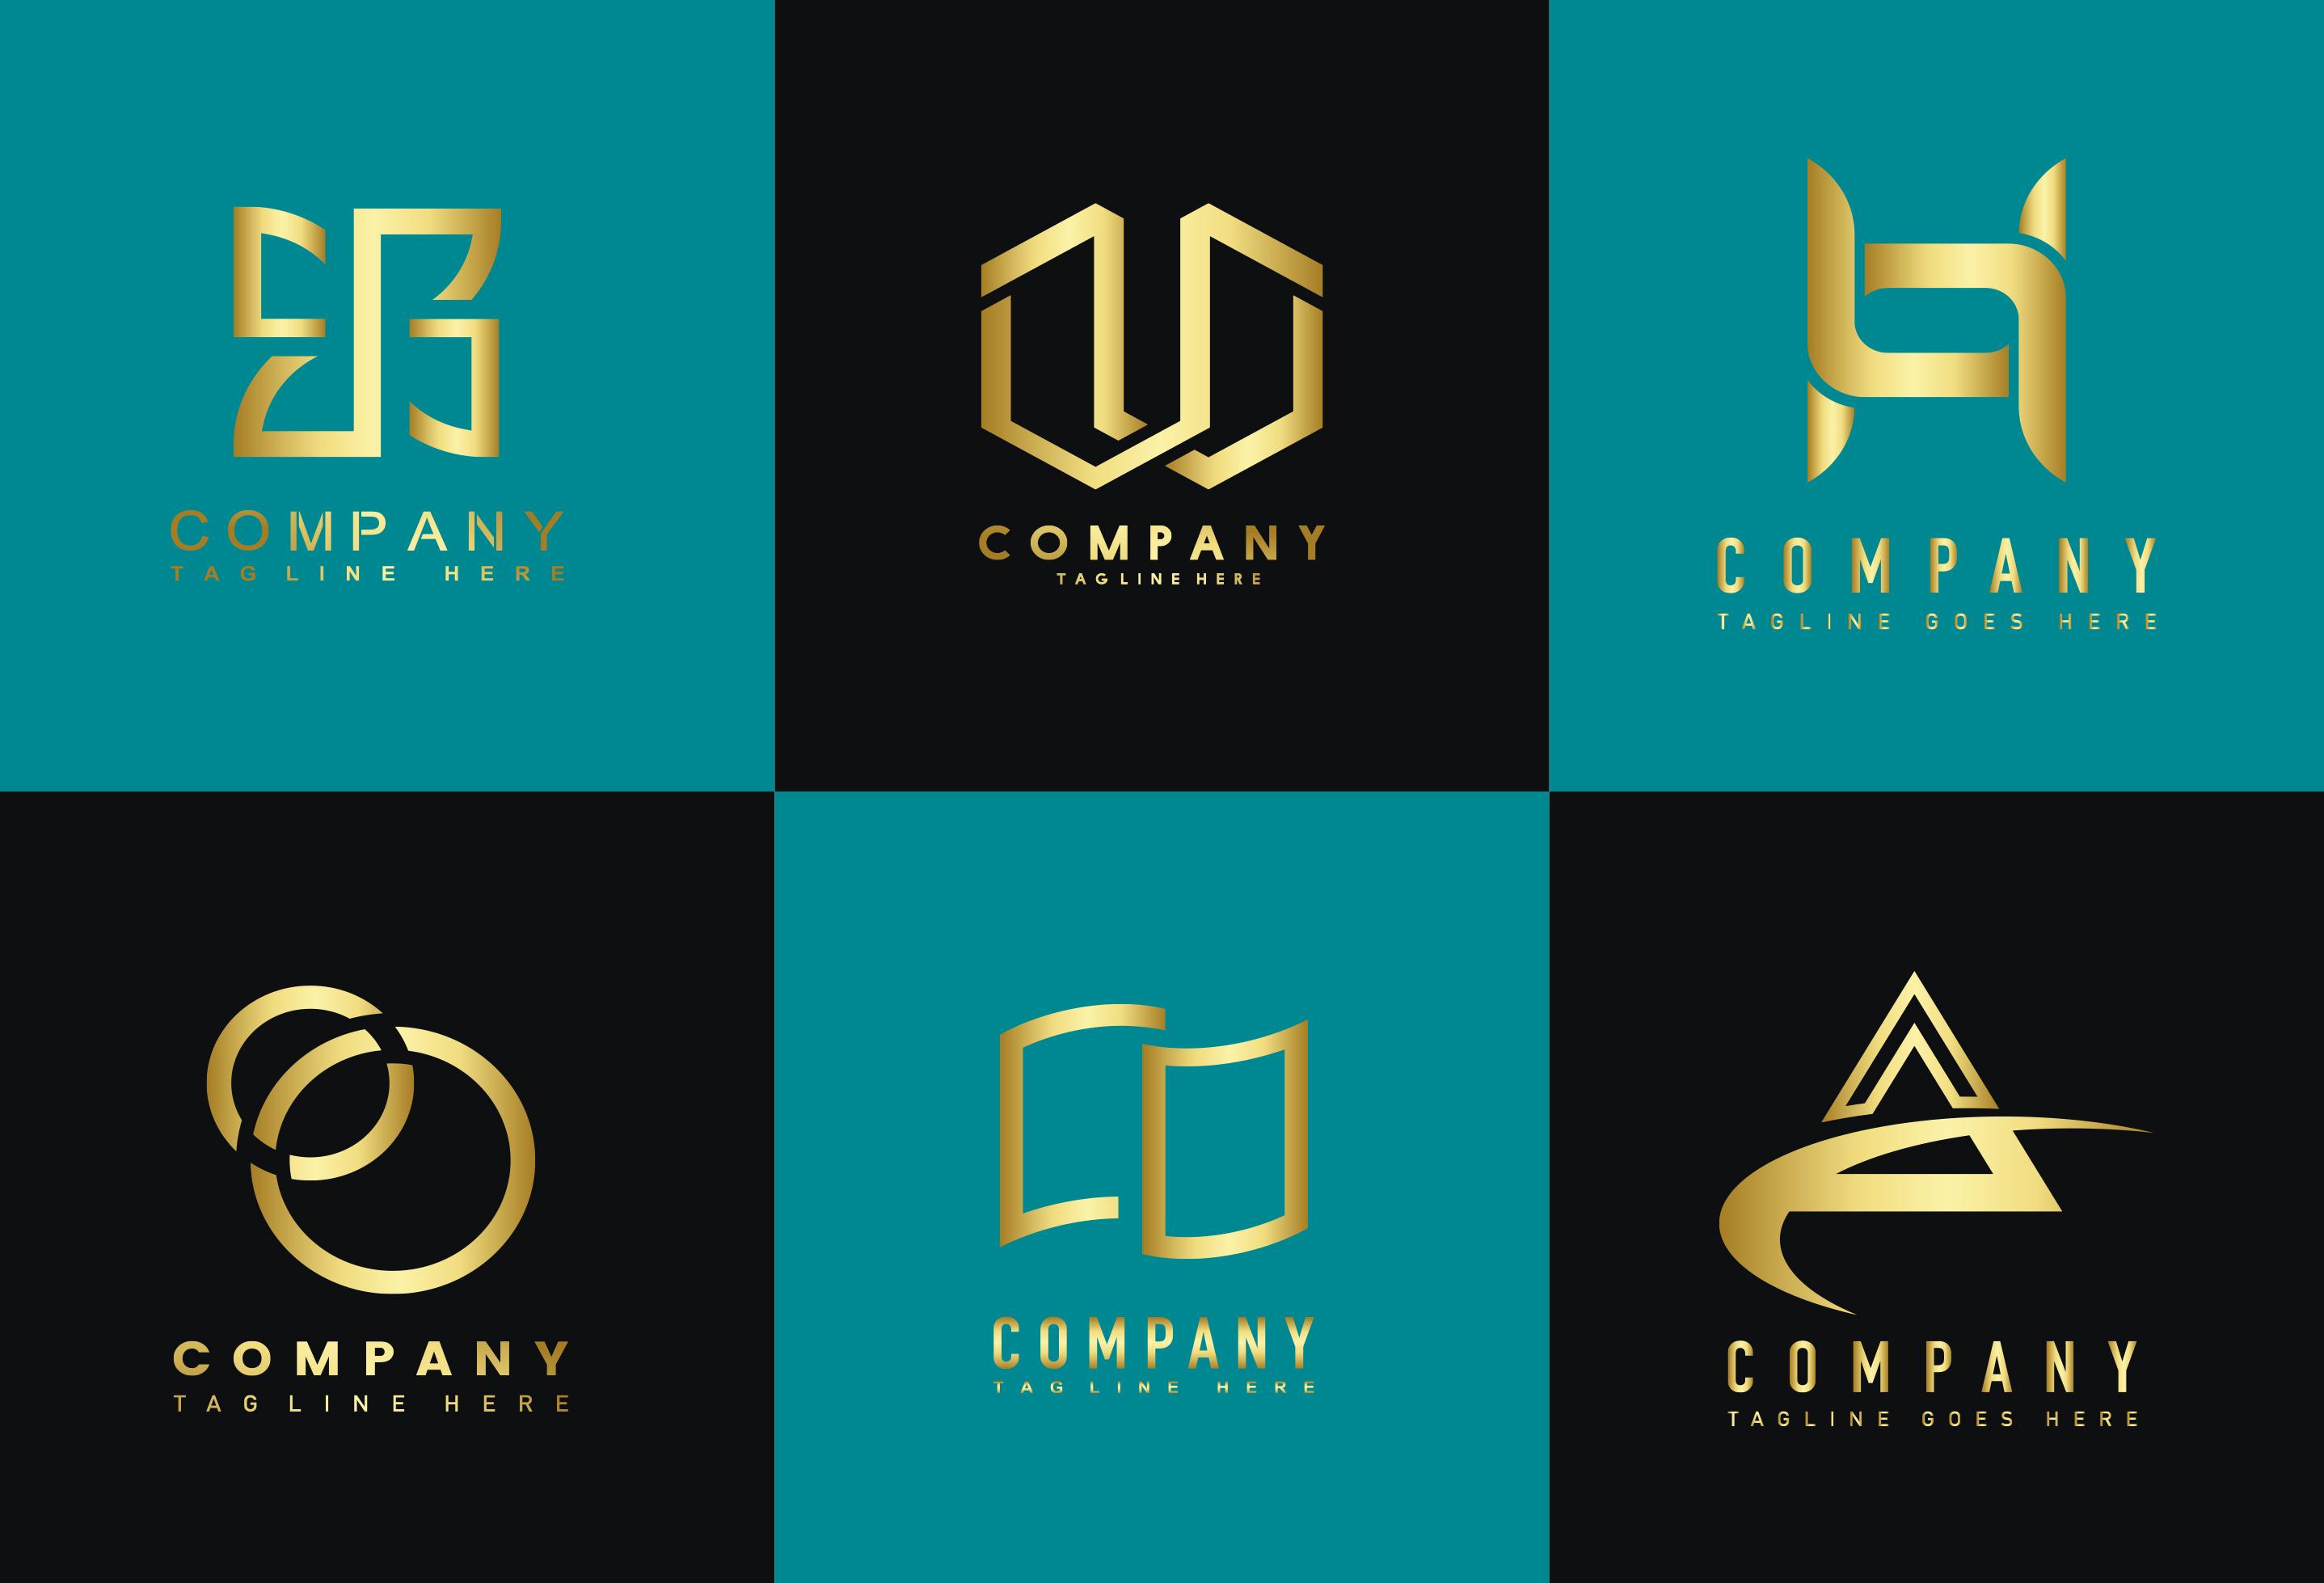 I will make modern flat minimalist logo and branding design